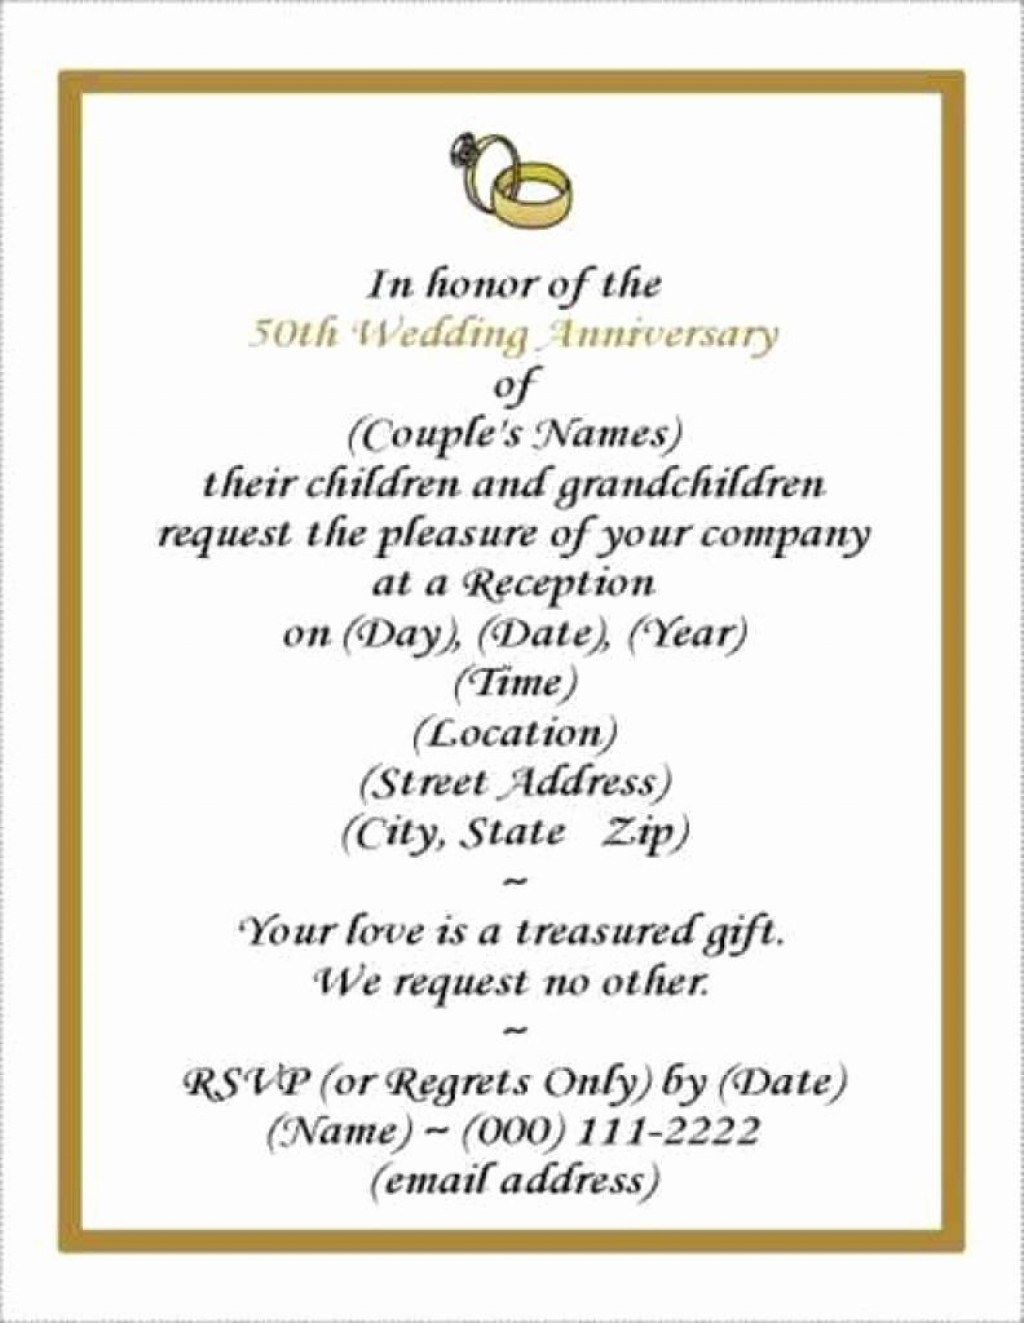 001 Rare Free Printable 50th Wedding Anniversary Invitation Template Design Large